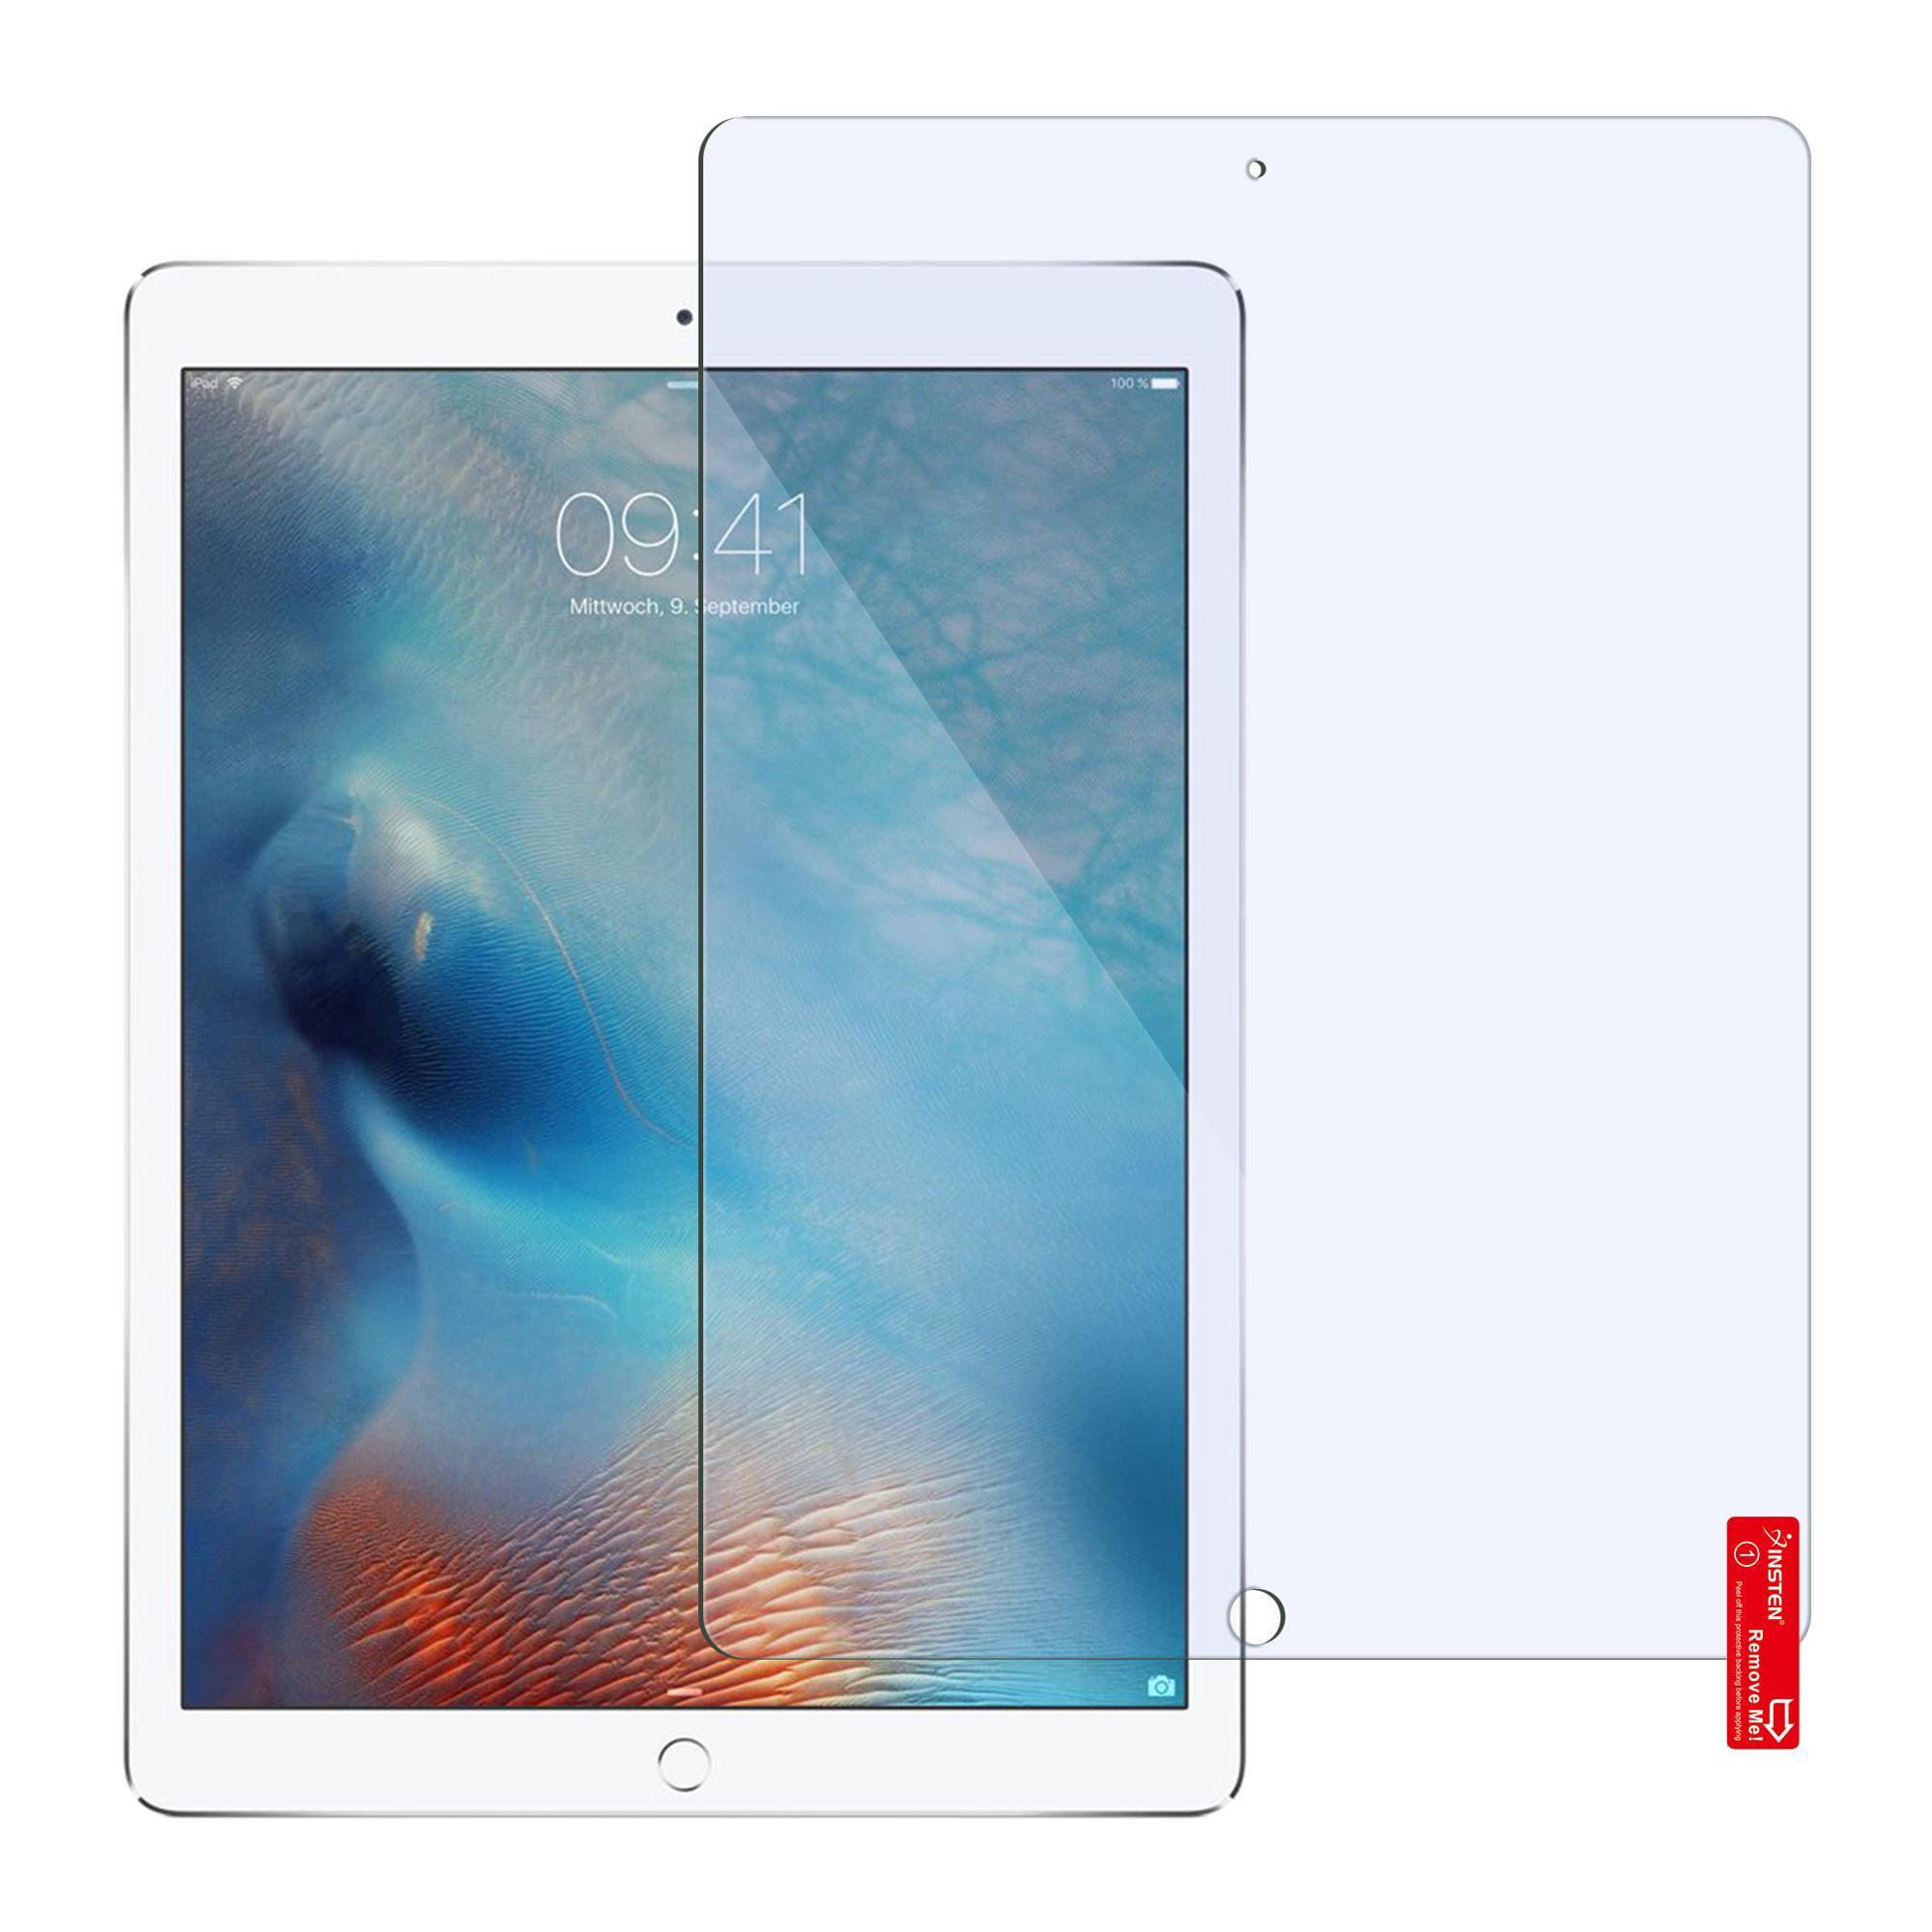 "Insten Matte Anti-Glare Screen Protector Film For Apple iPad Pro 10.5"" (Anti-Scratch, Bubble-free, Anti-Fingerprint)"